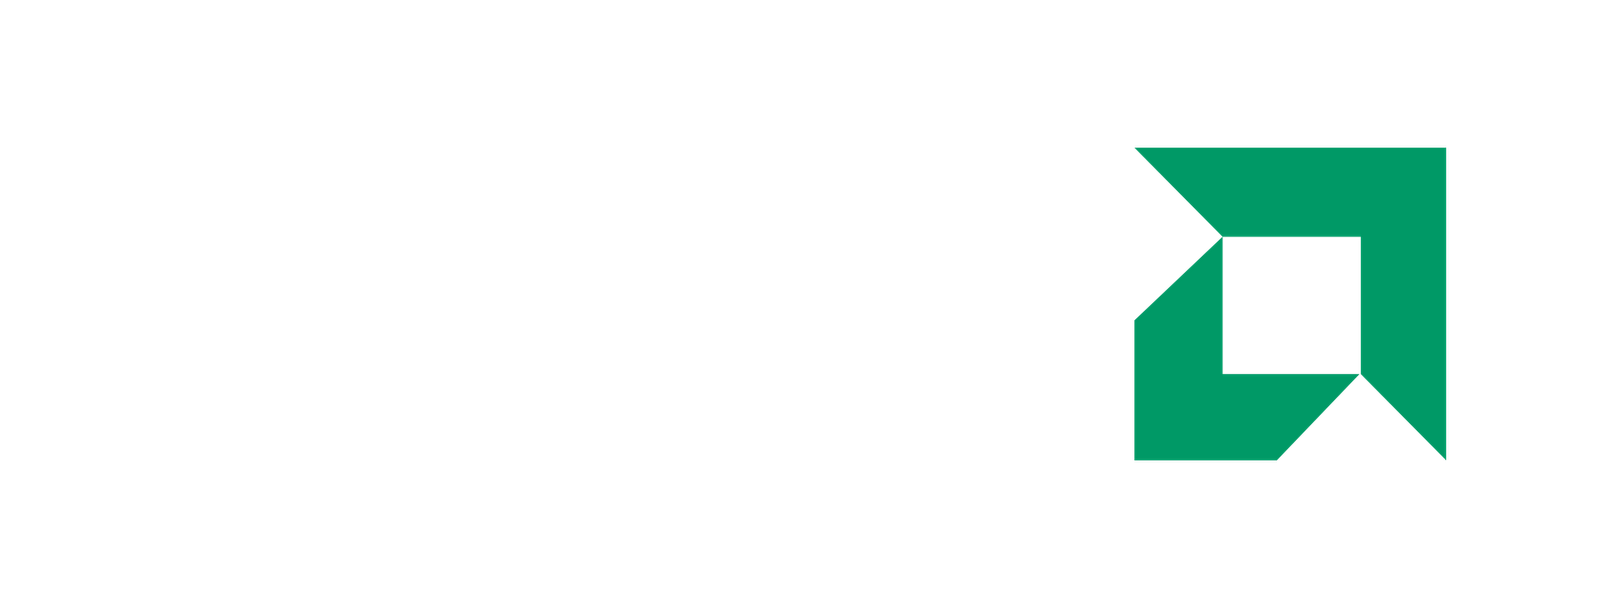 NADIA Art Logo: AMD Logo